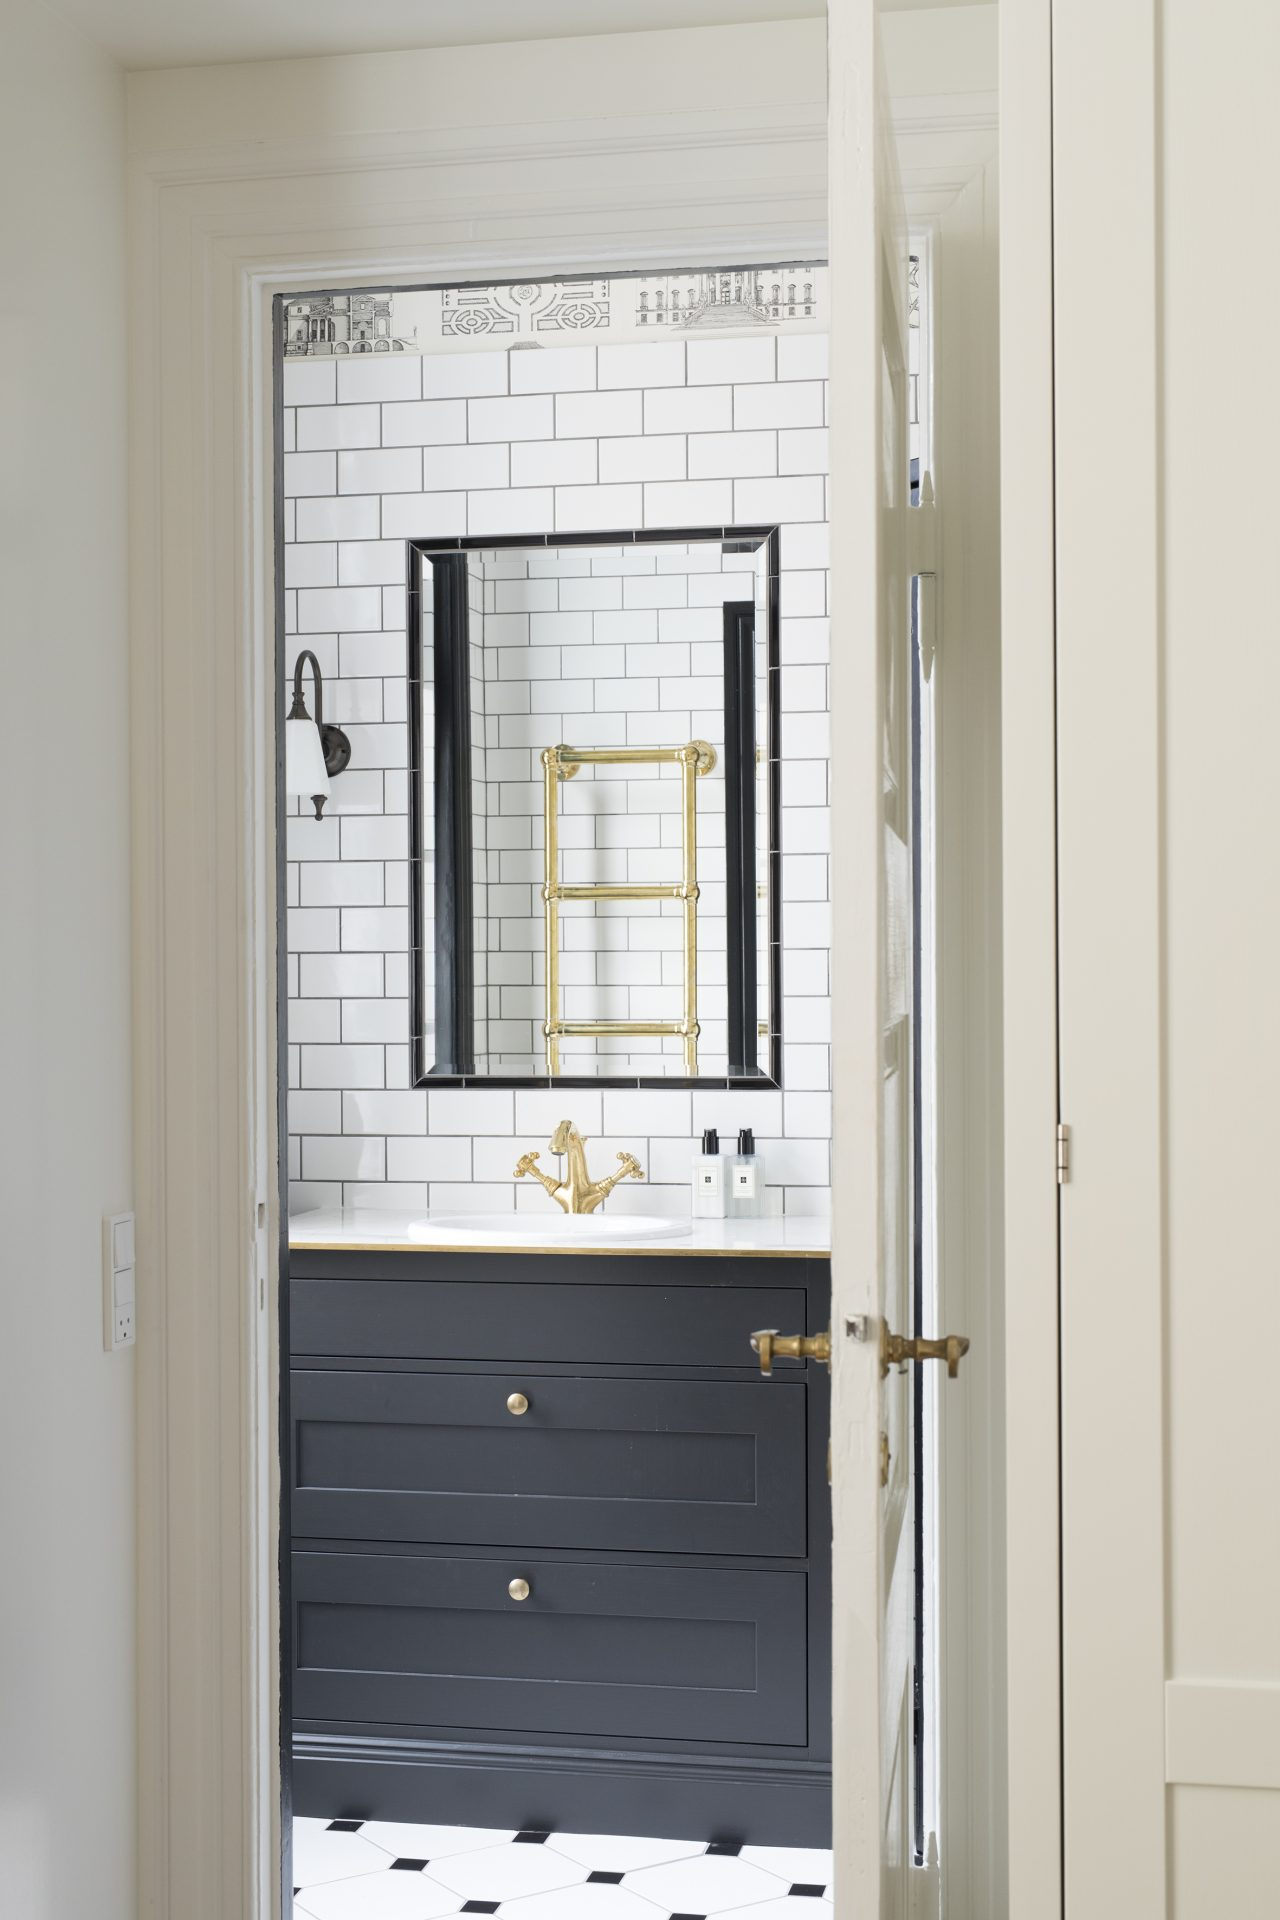 171027-dressingroom-daldy-dunvit-osterbro-16094-002.jpg